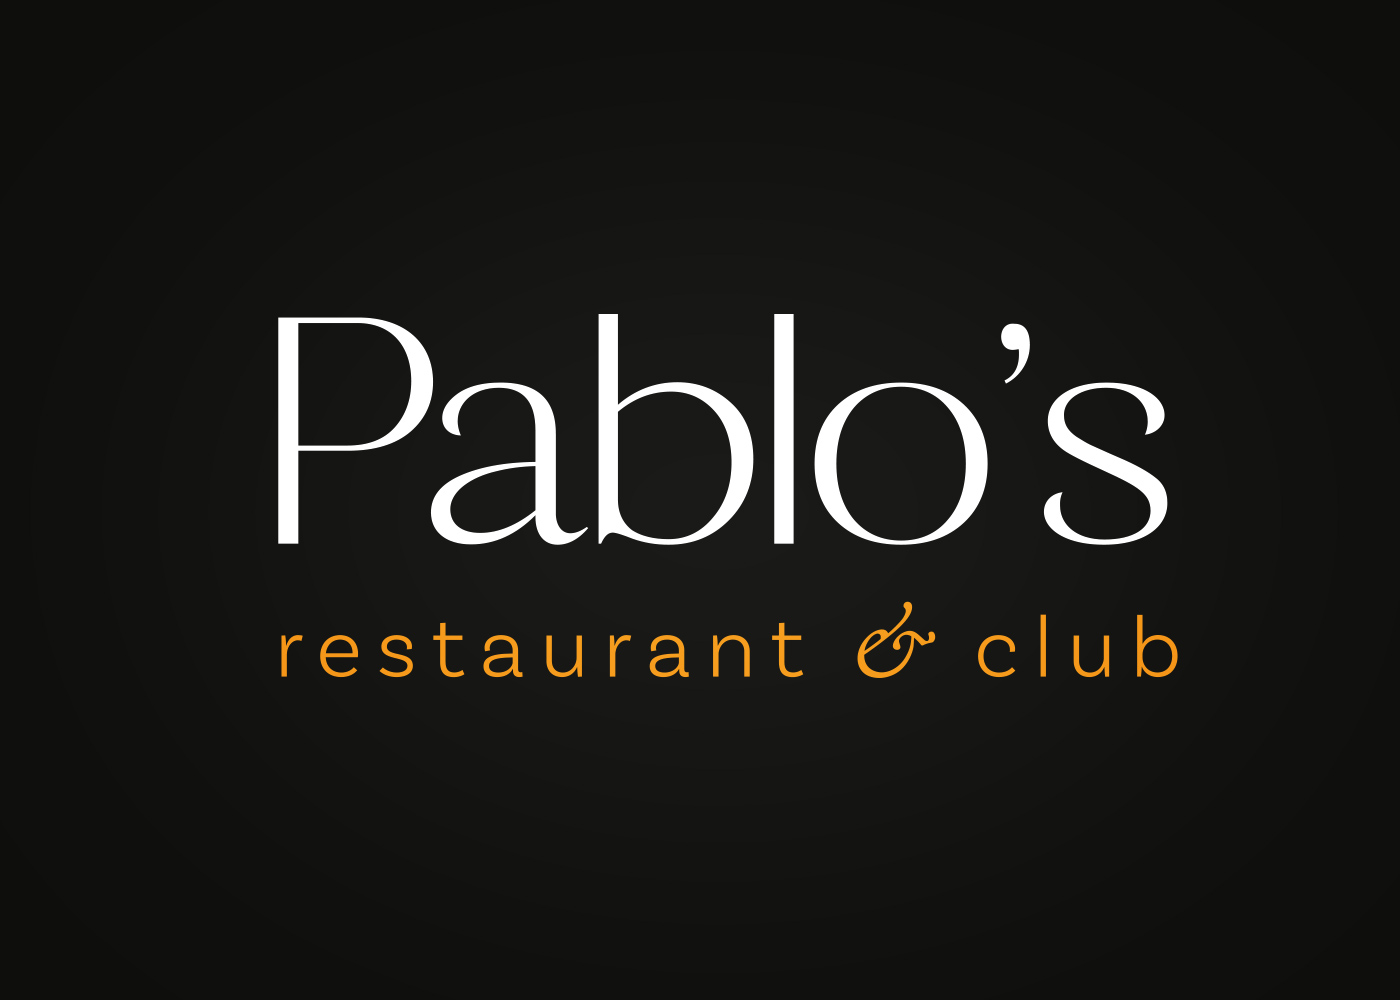 Visual Identity of Pablo's Restaurant & Club